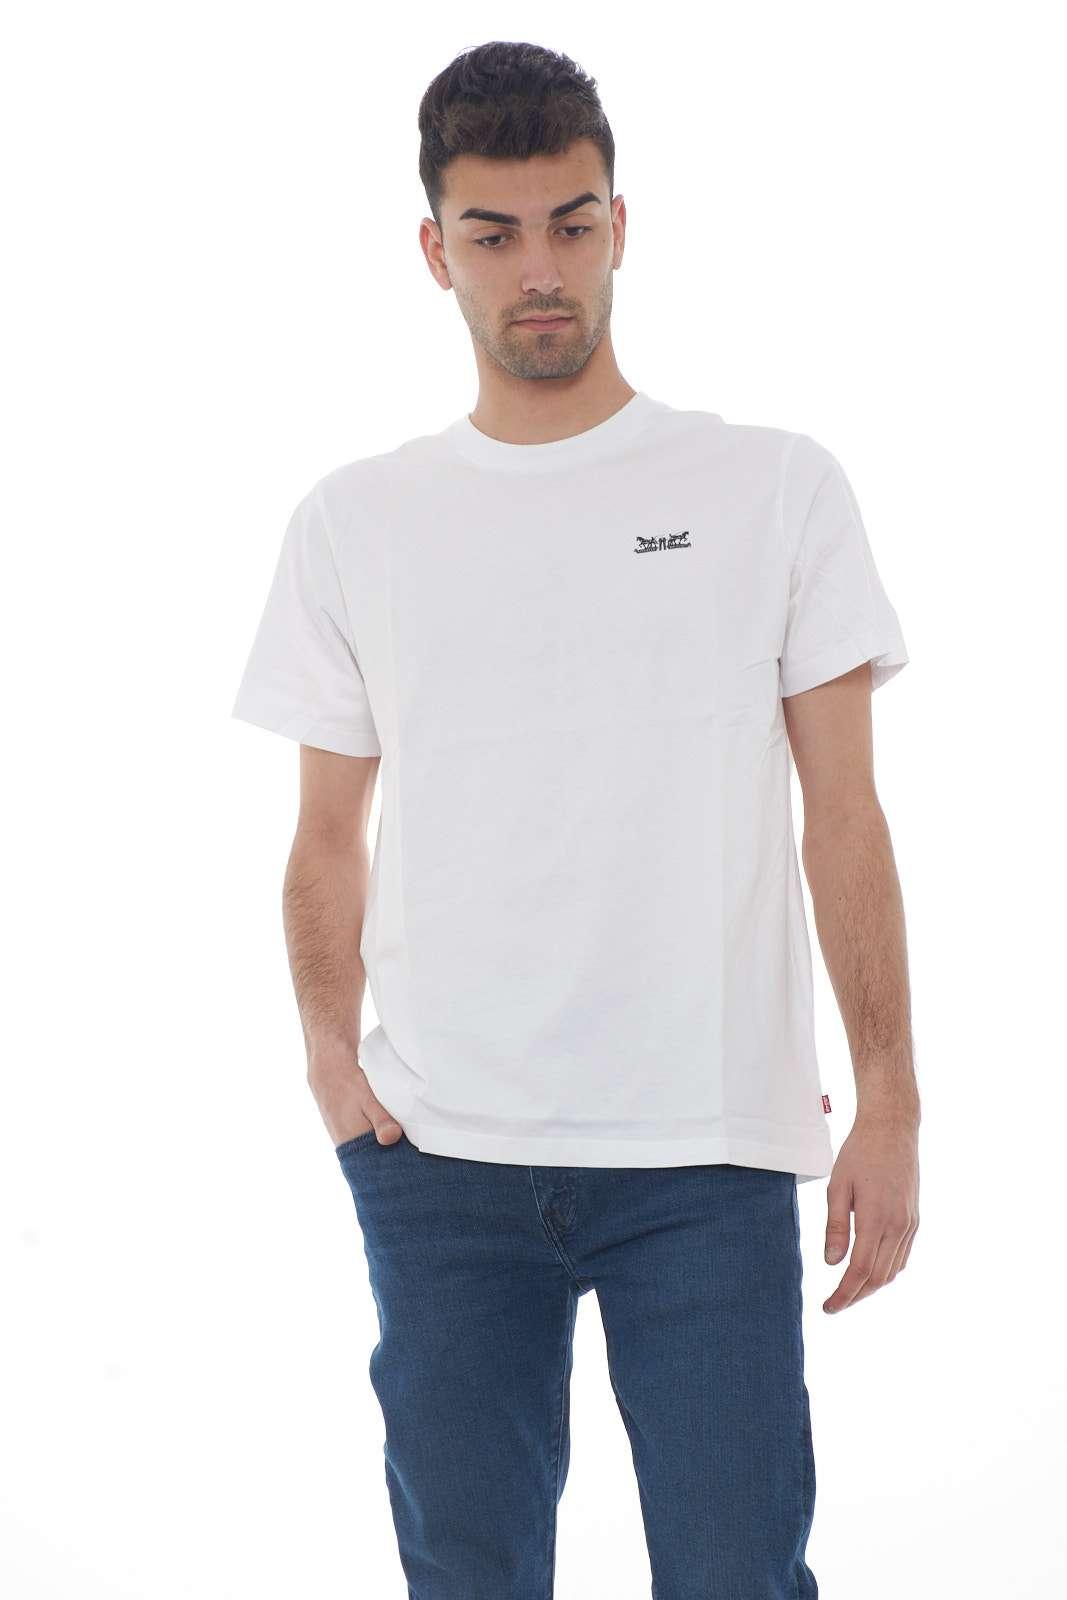 https://www.parmax.com/media/catalog/product/a/i/PE-outlet_parmax-t-shirt-uomo-Levis-699780032-A.jpg